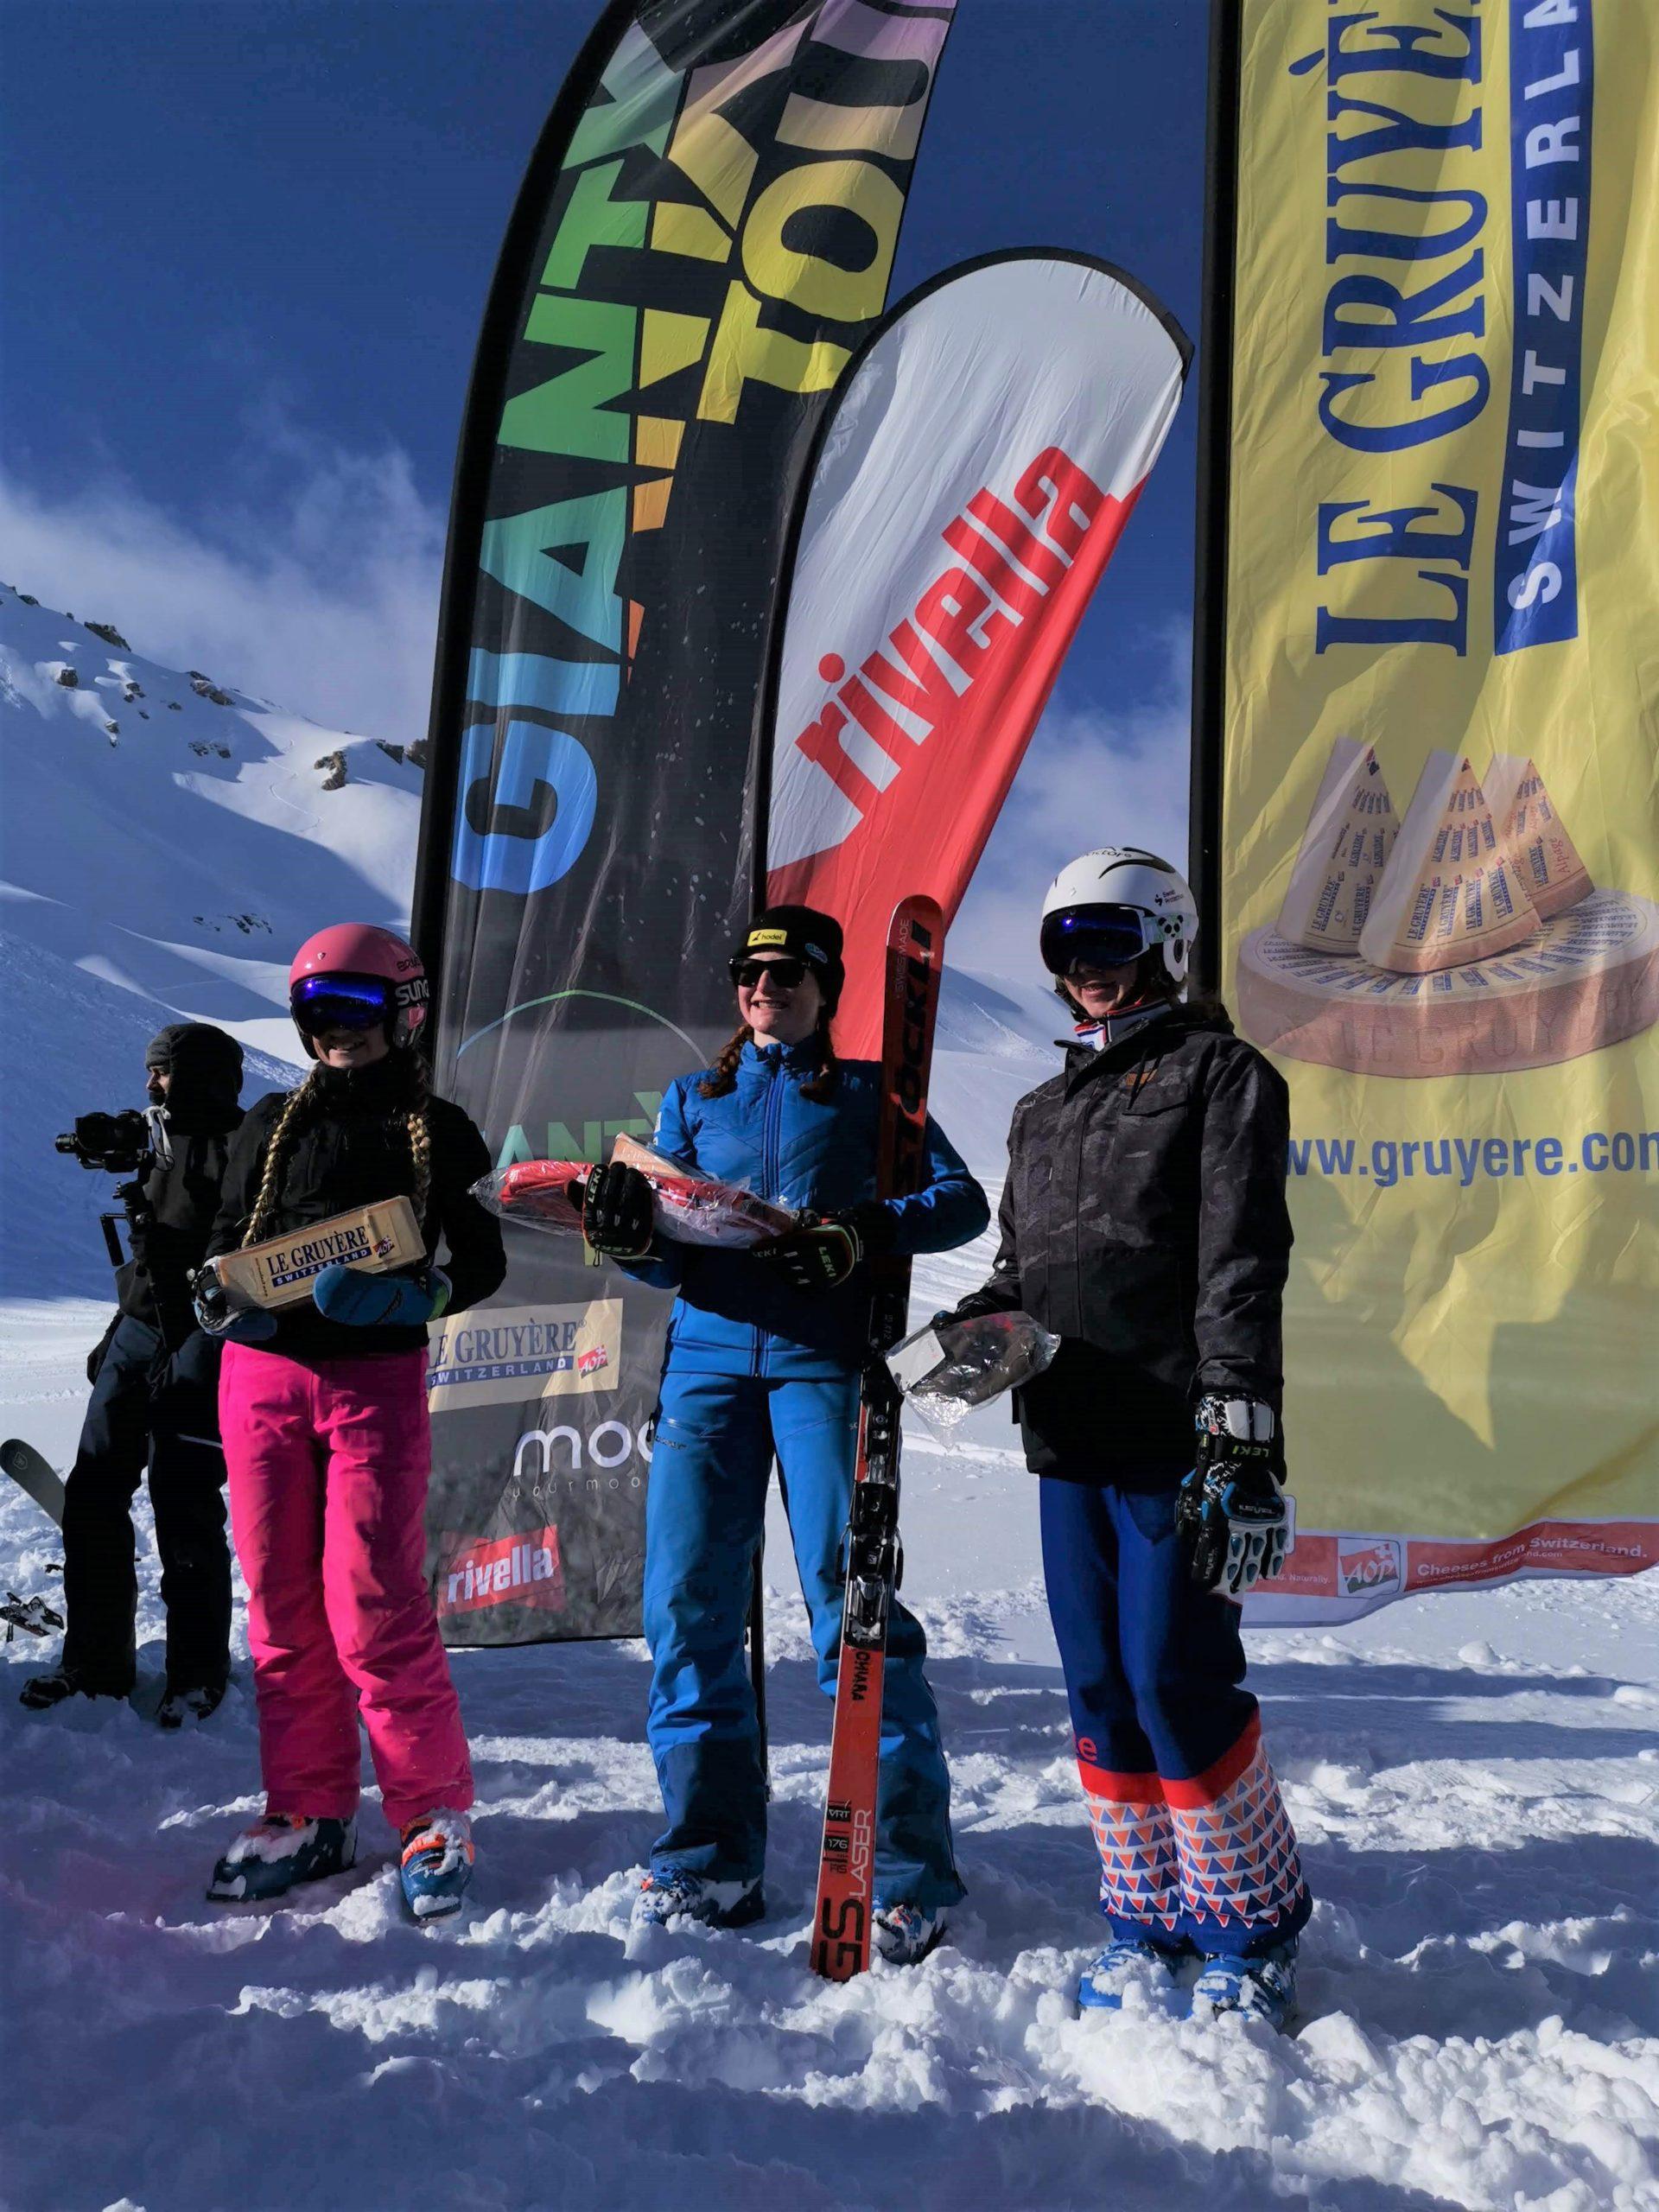 Chiara von Moos Skicross Grimentz 2020